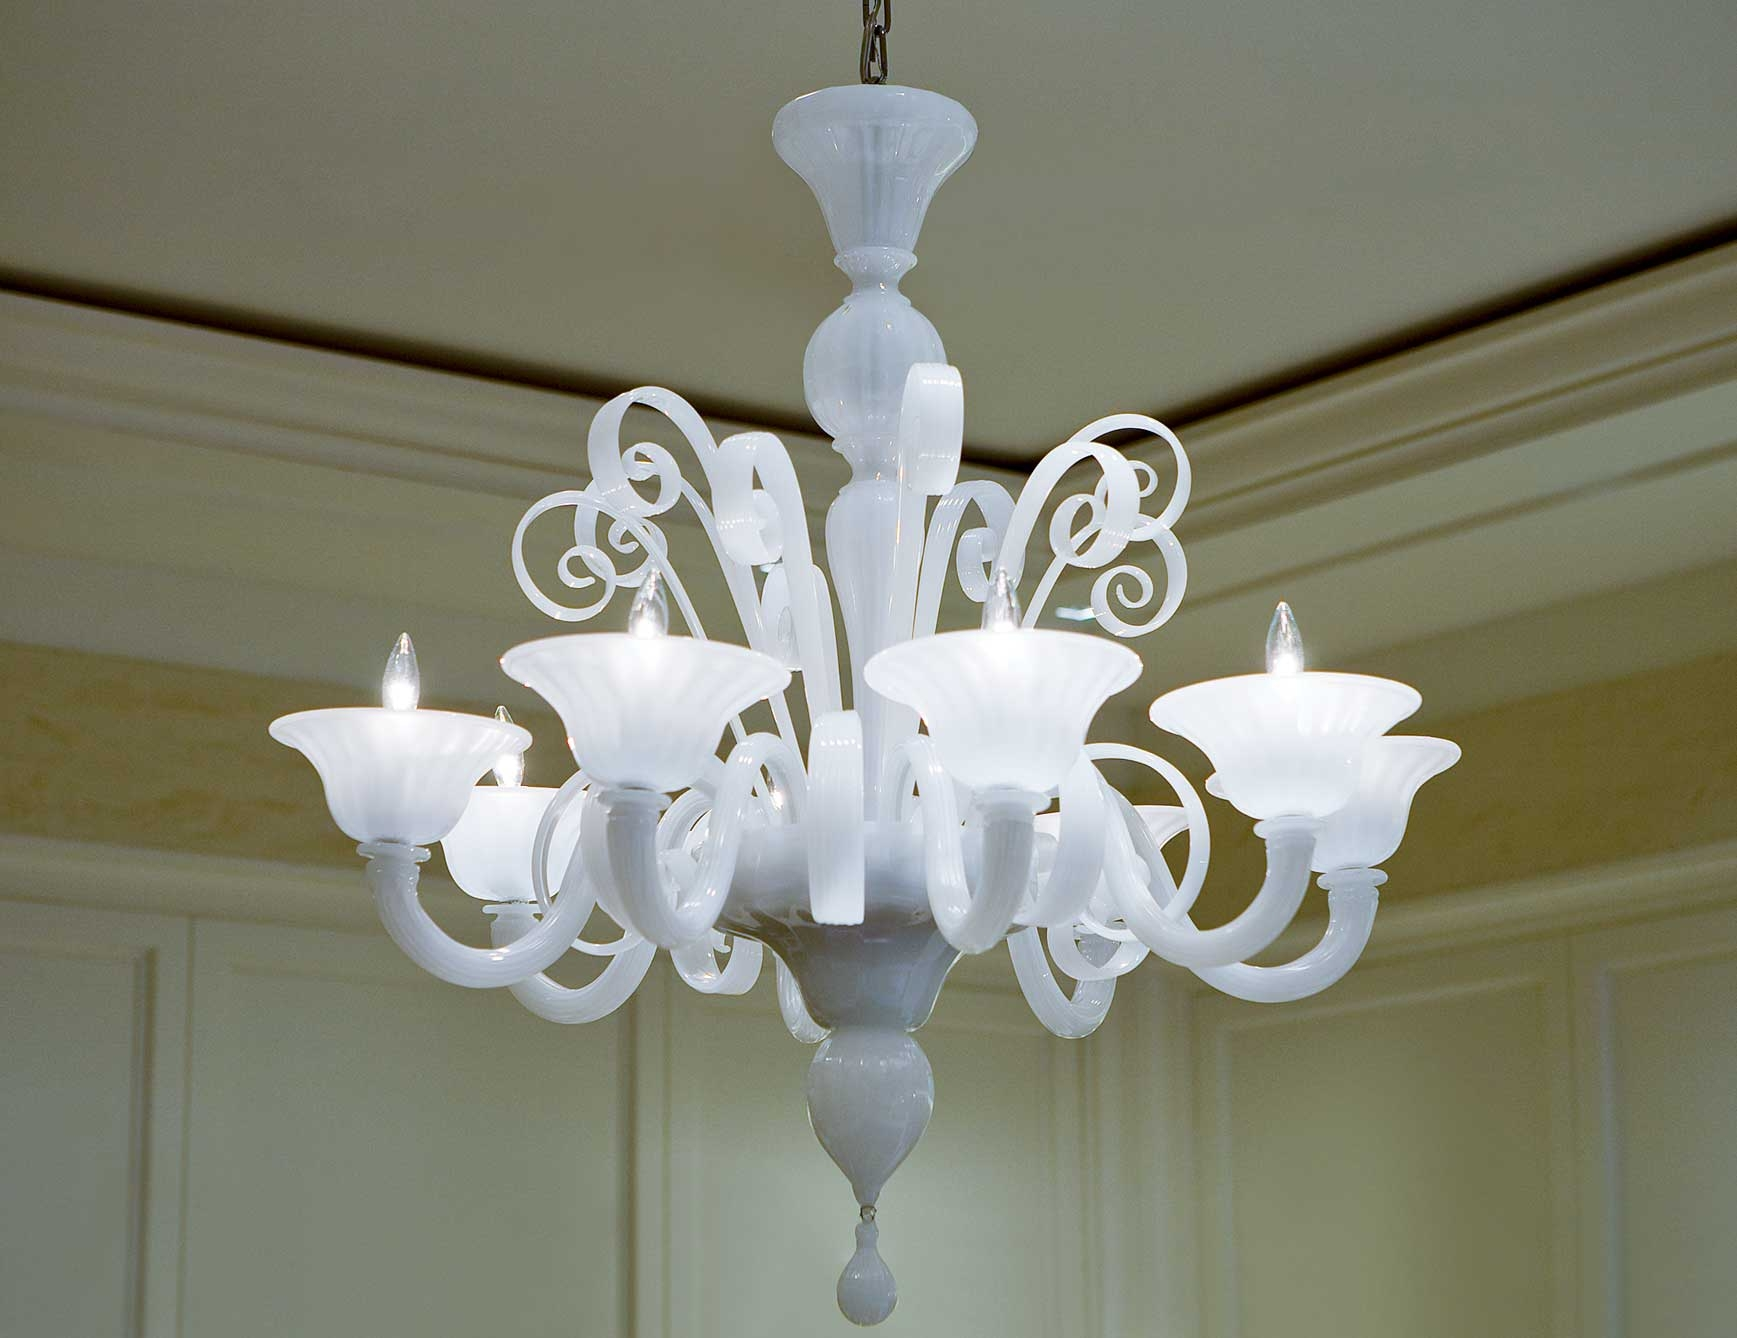 Murano Glass Chandeliers Italian Designer Luxury Chandeliers Regarding White Chandeliers (View 14 of 15)